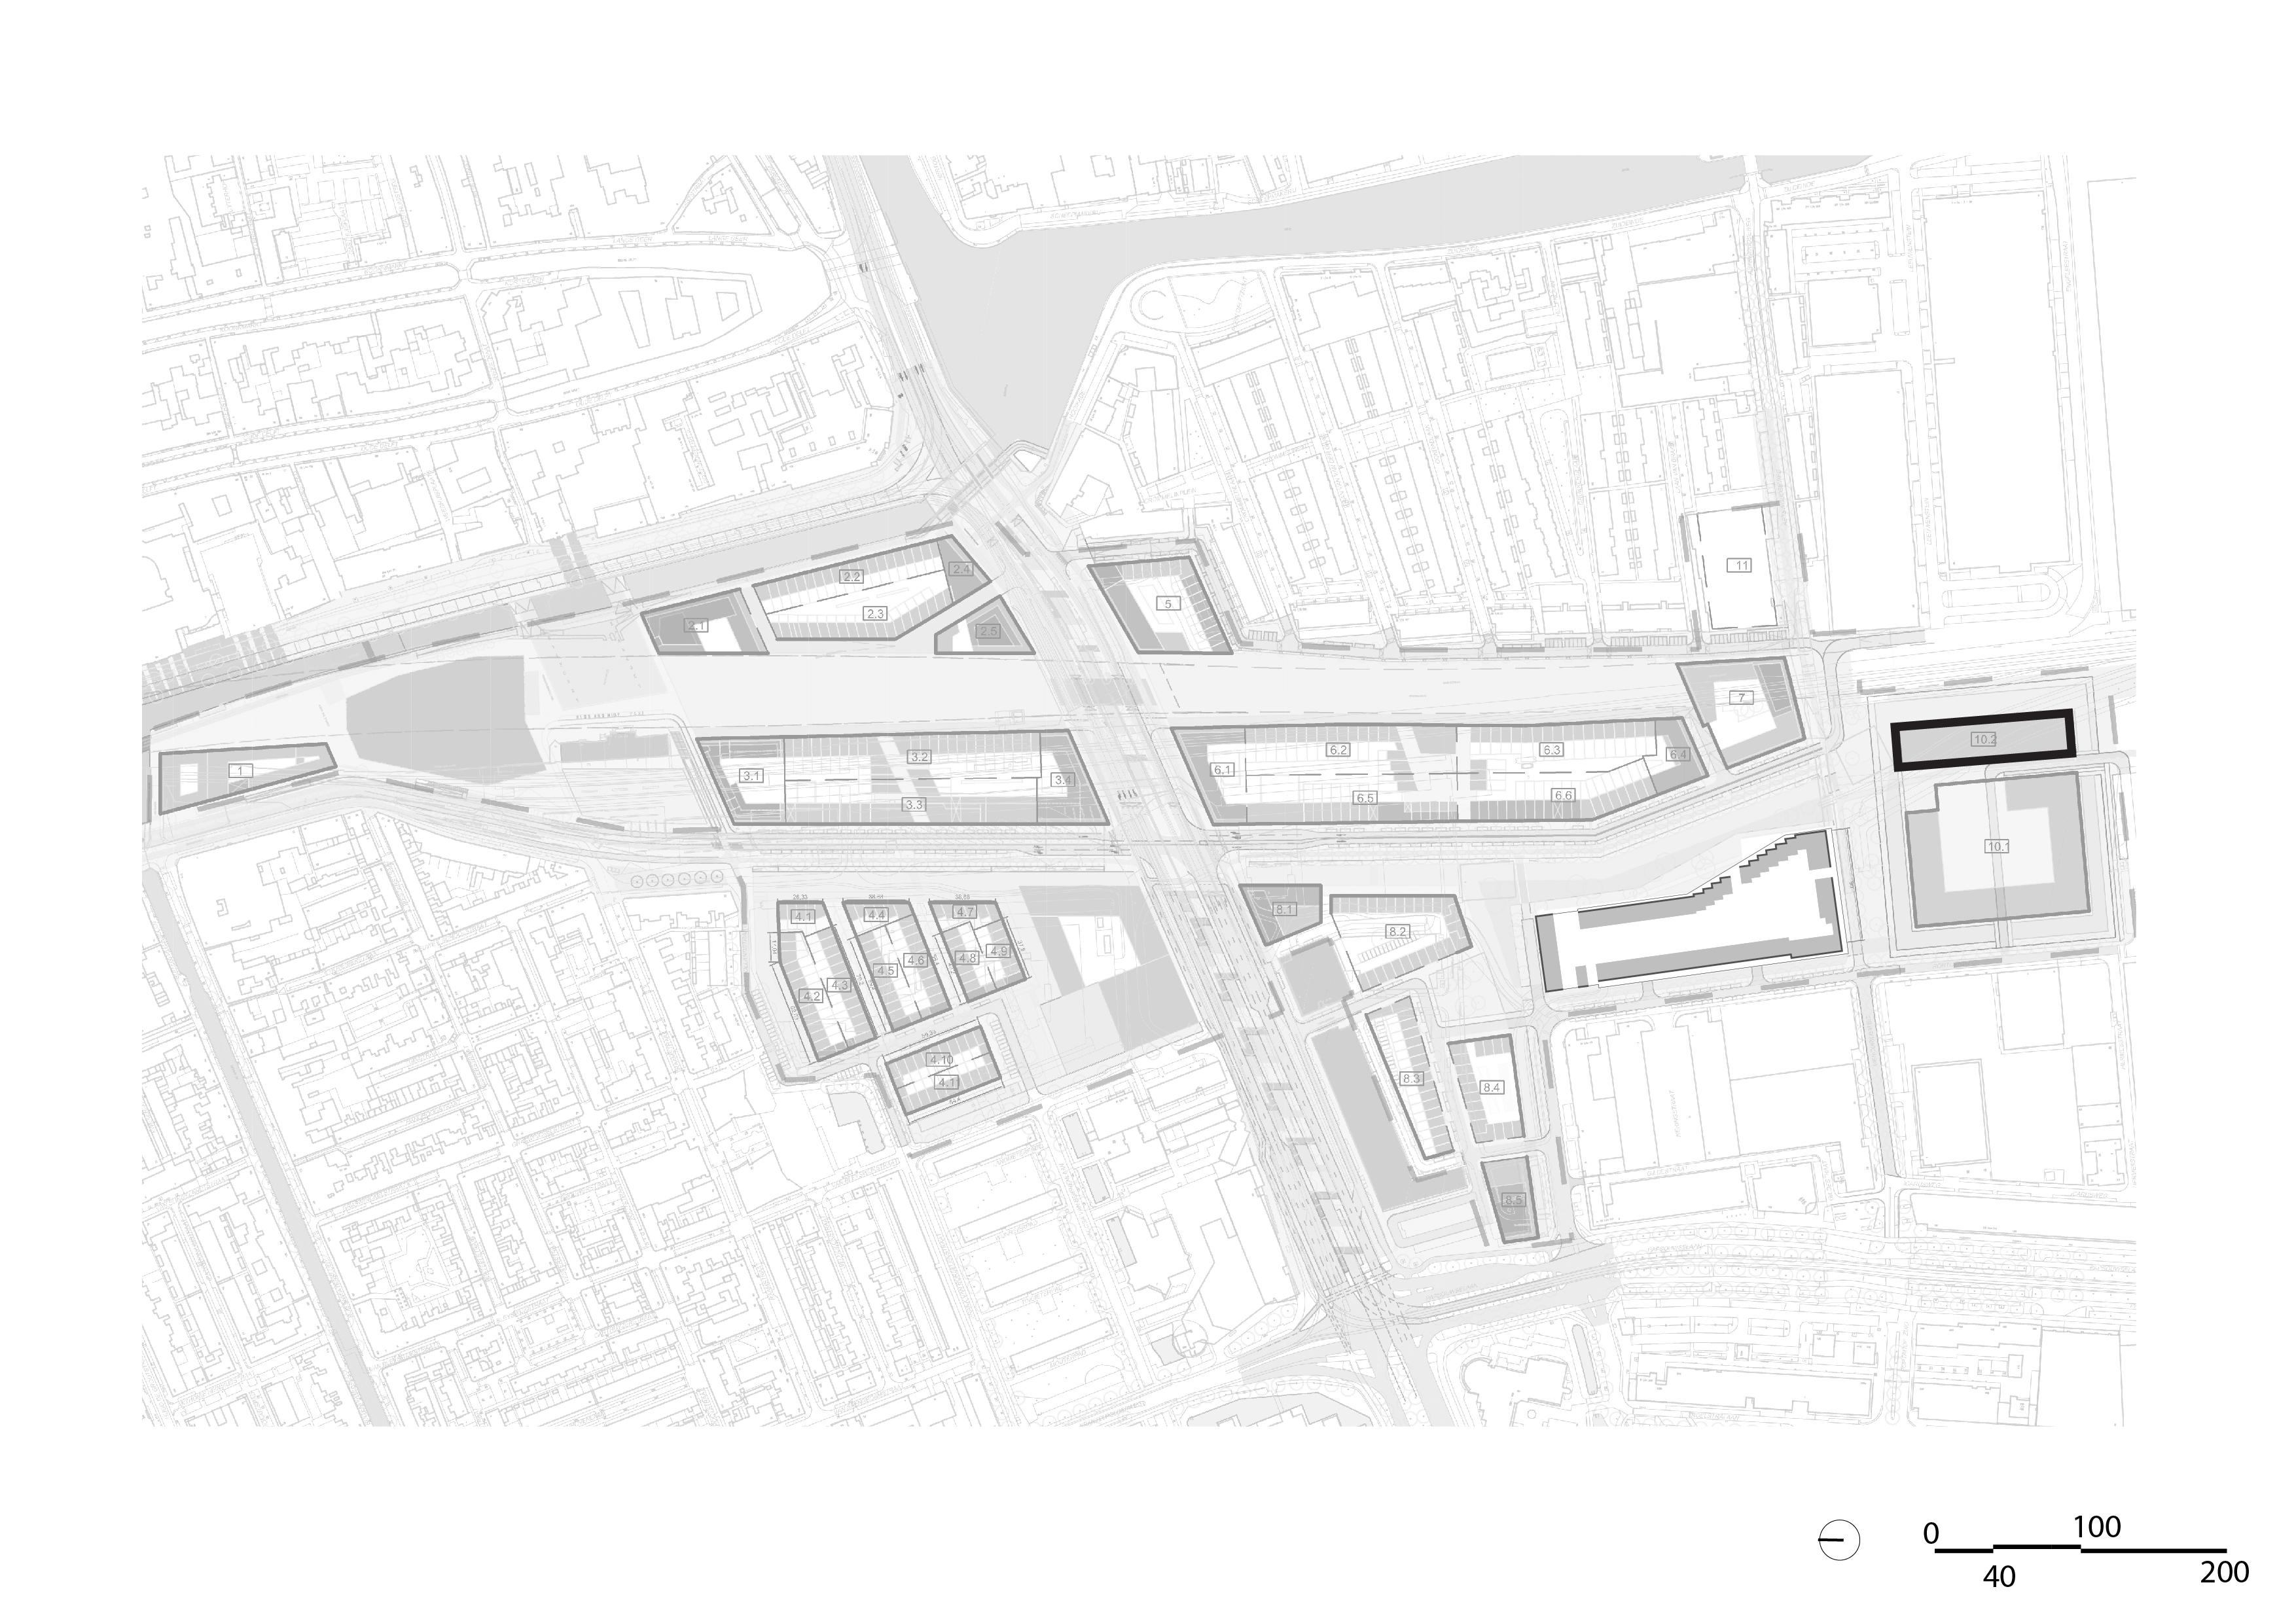 The Family Spoorzone Delft – Situatie